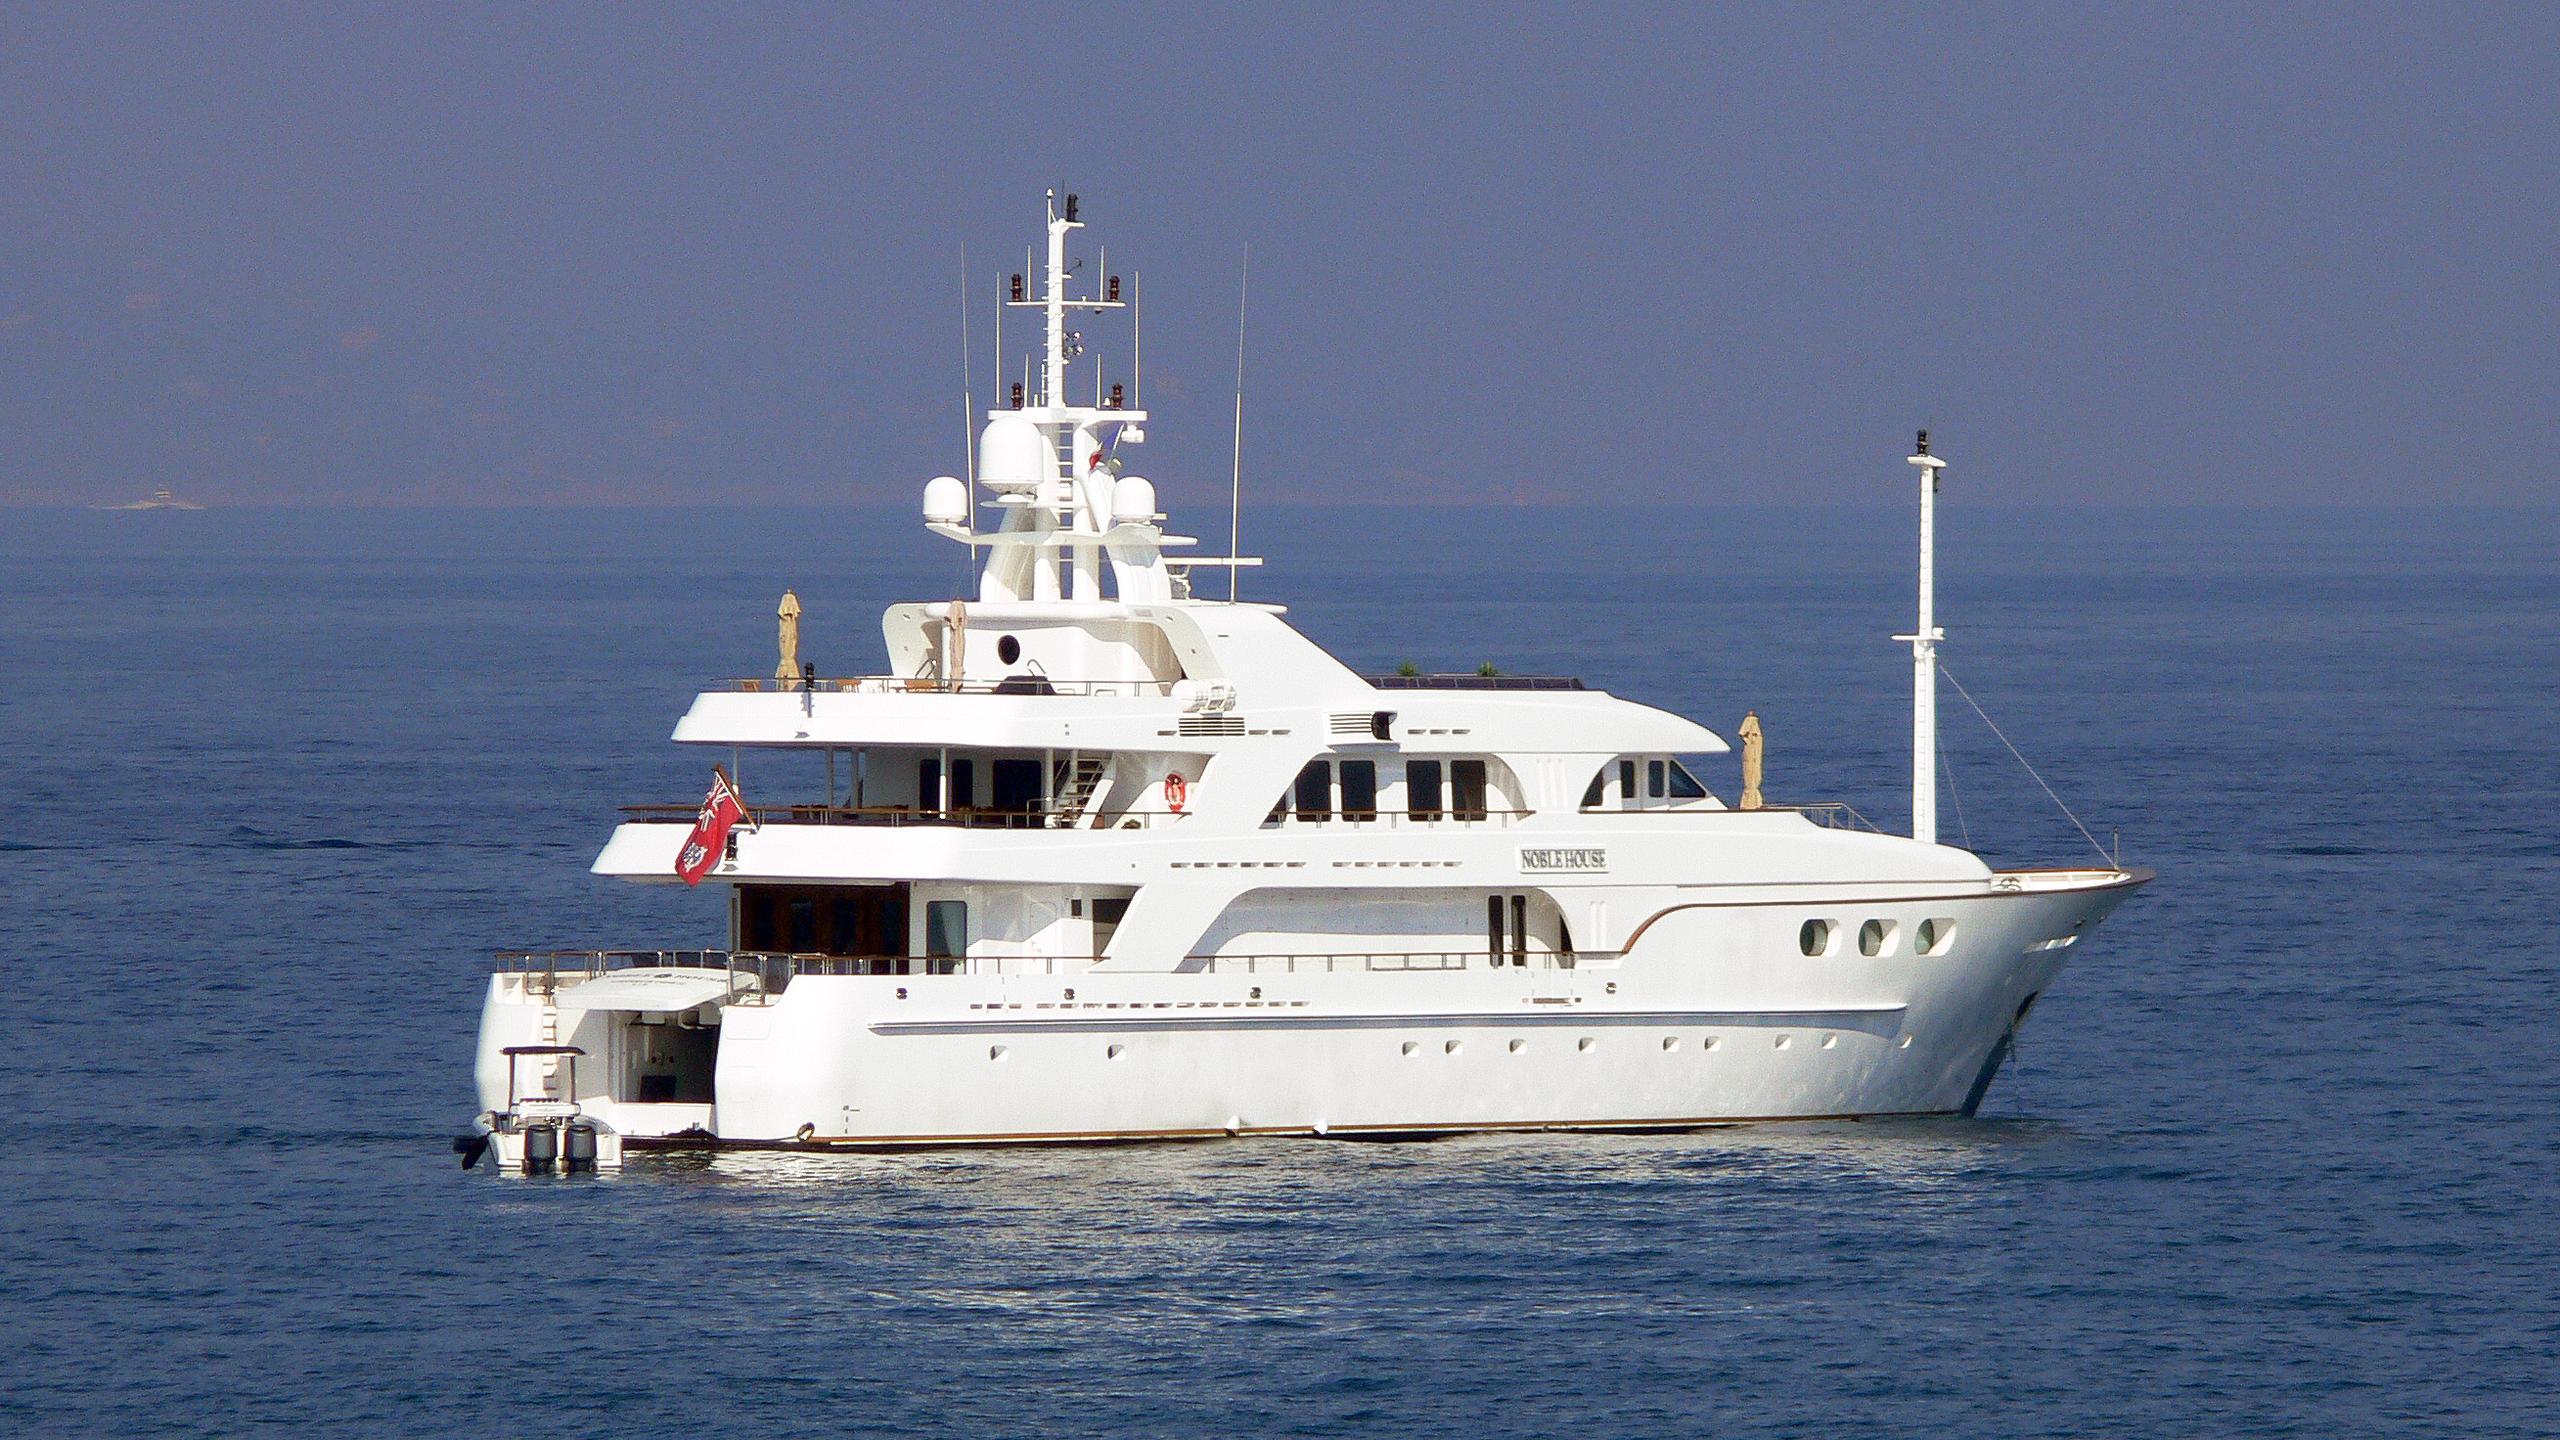 noble-house-motor-yacht-sensation-2006-53m--half-profile-before-refit